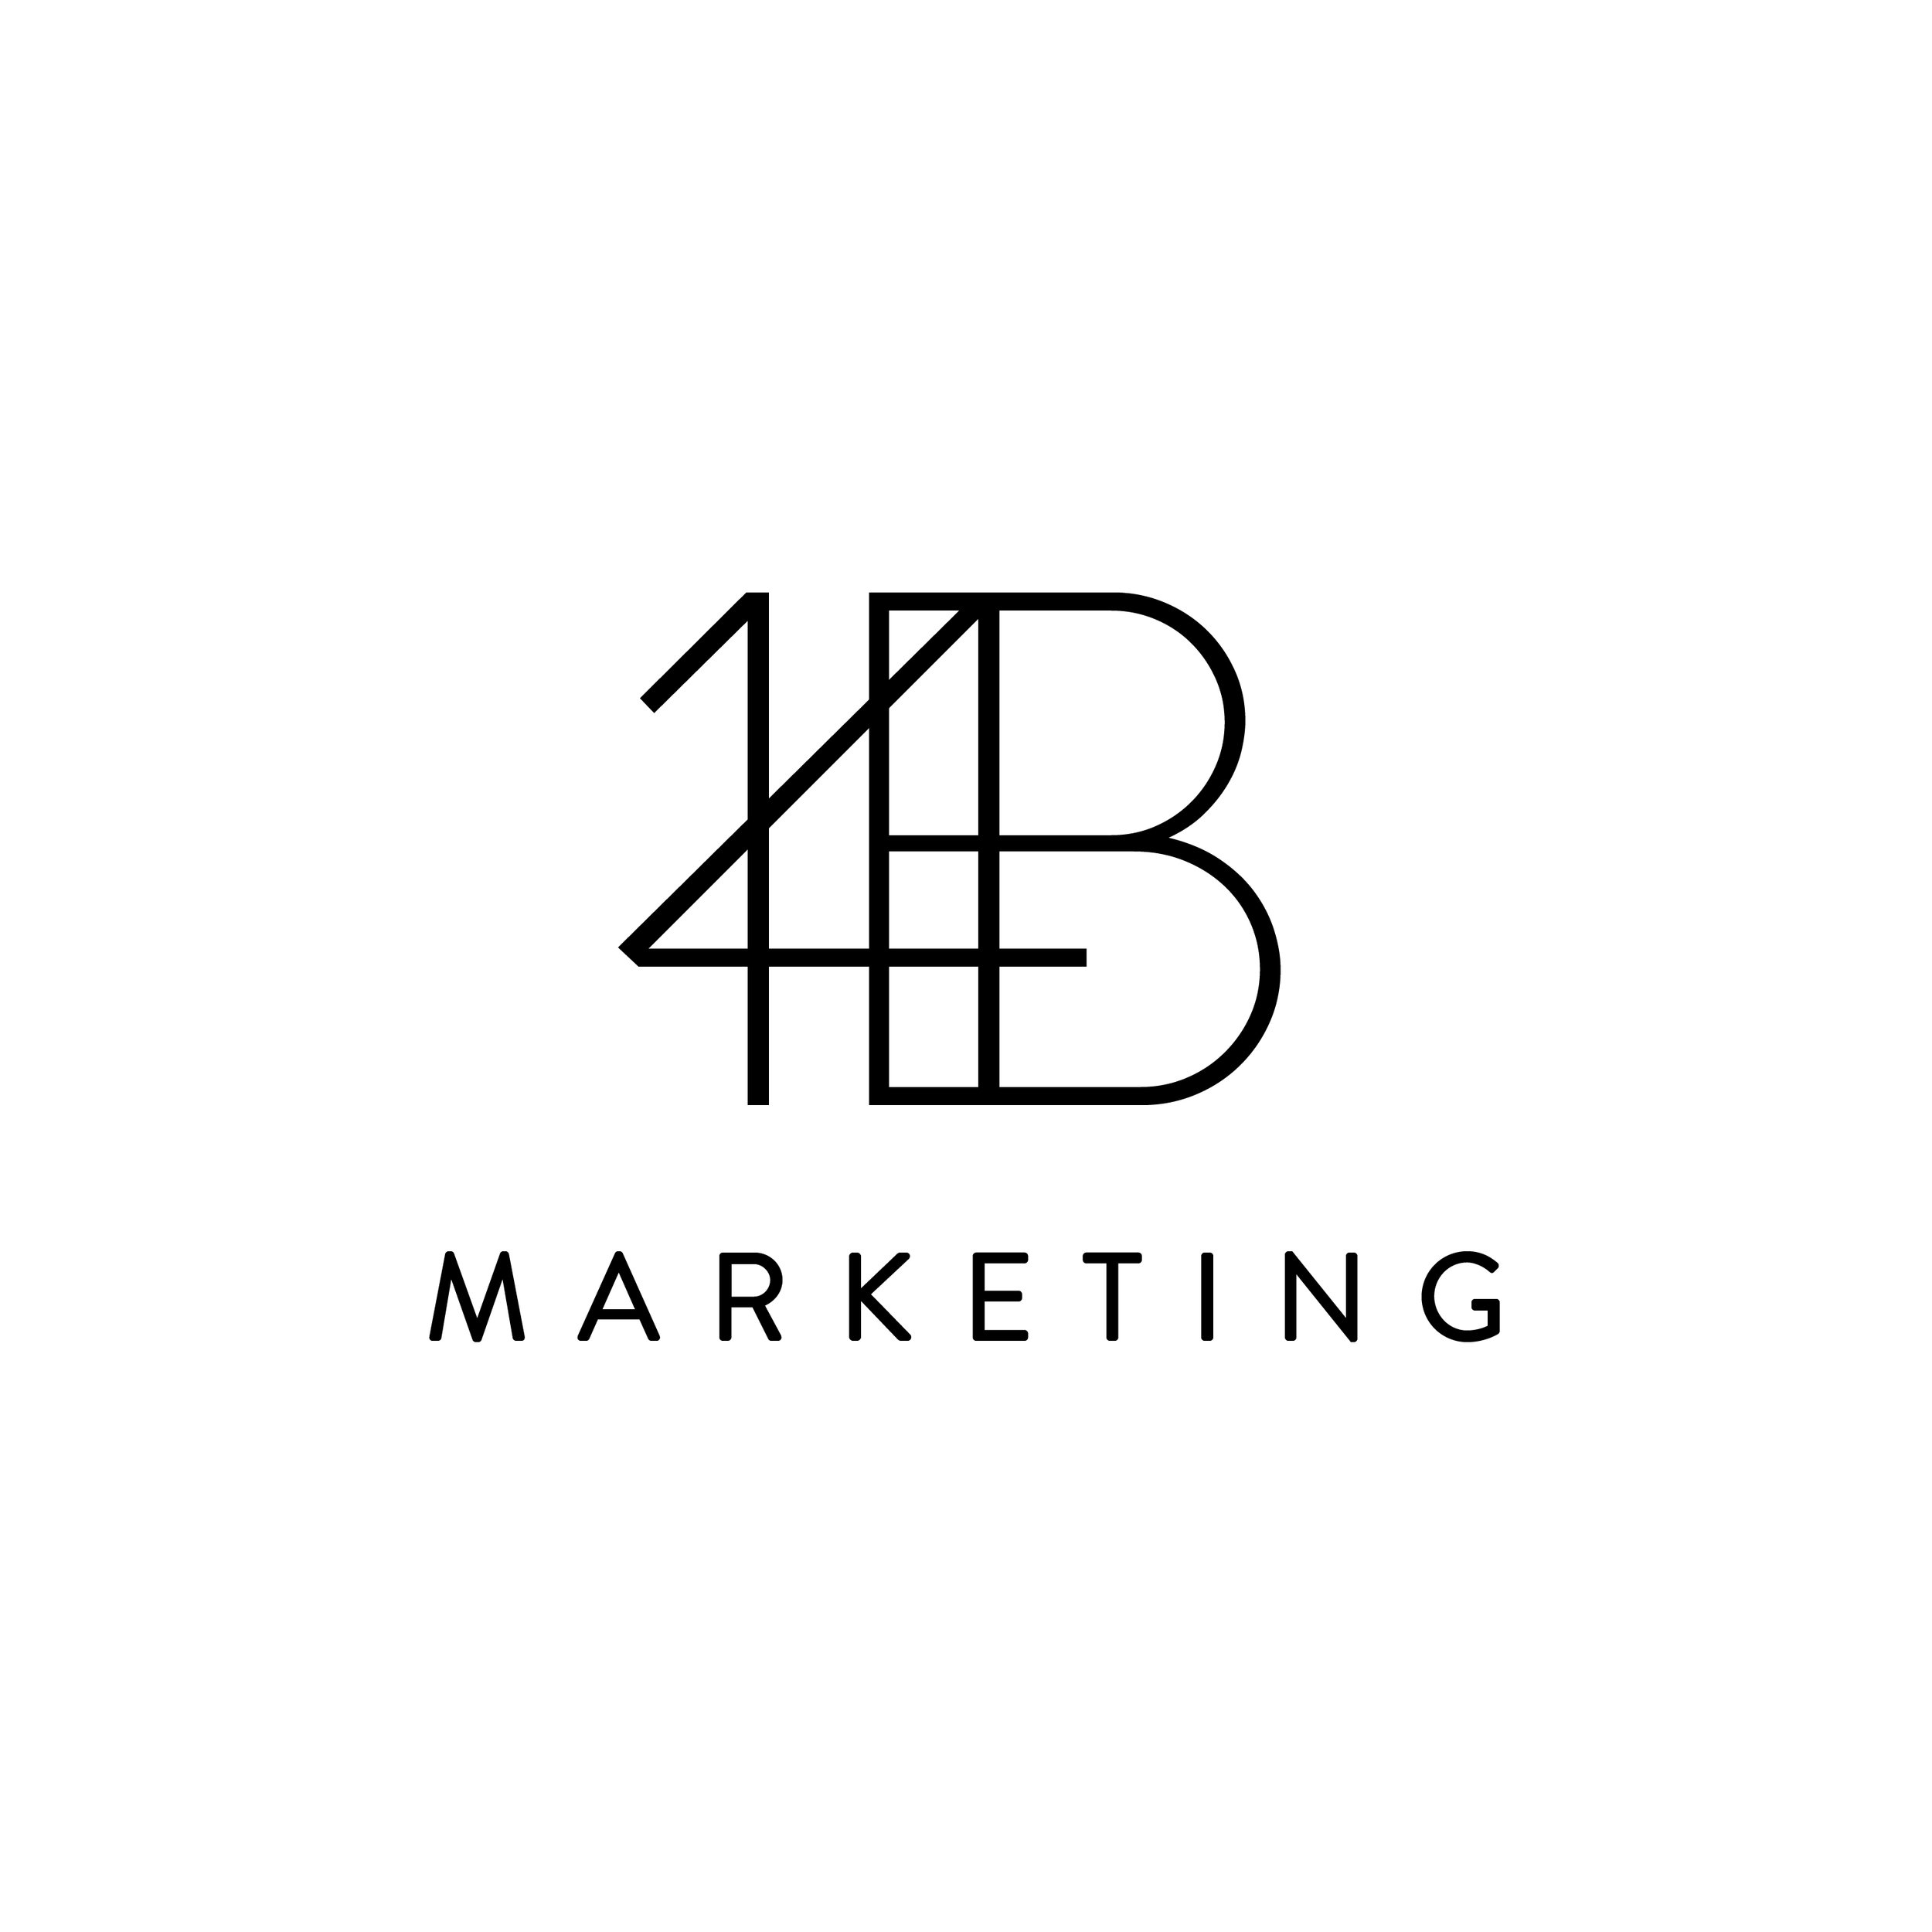 14B Marketing